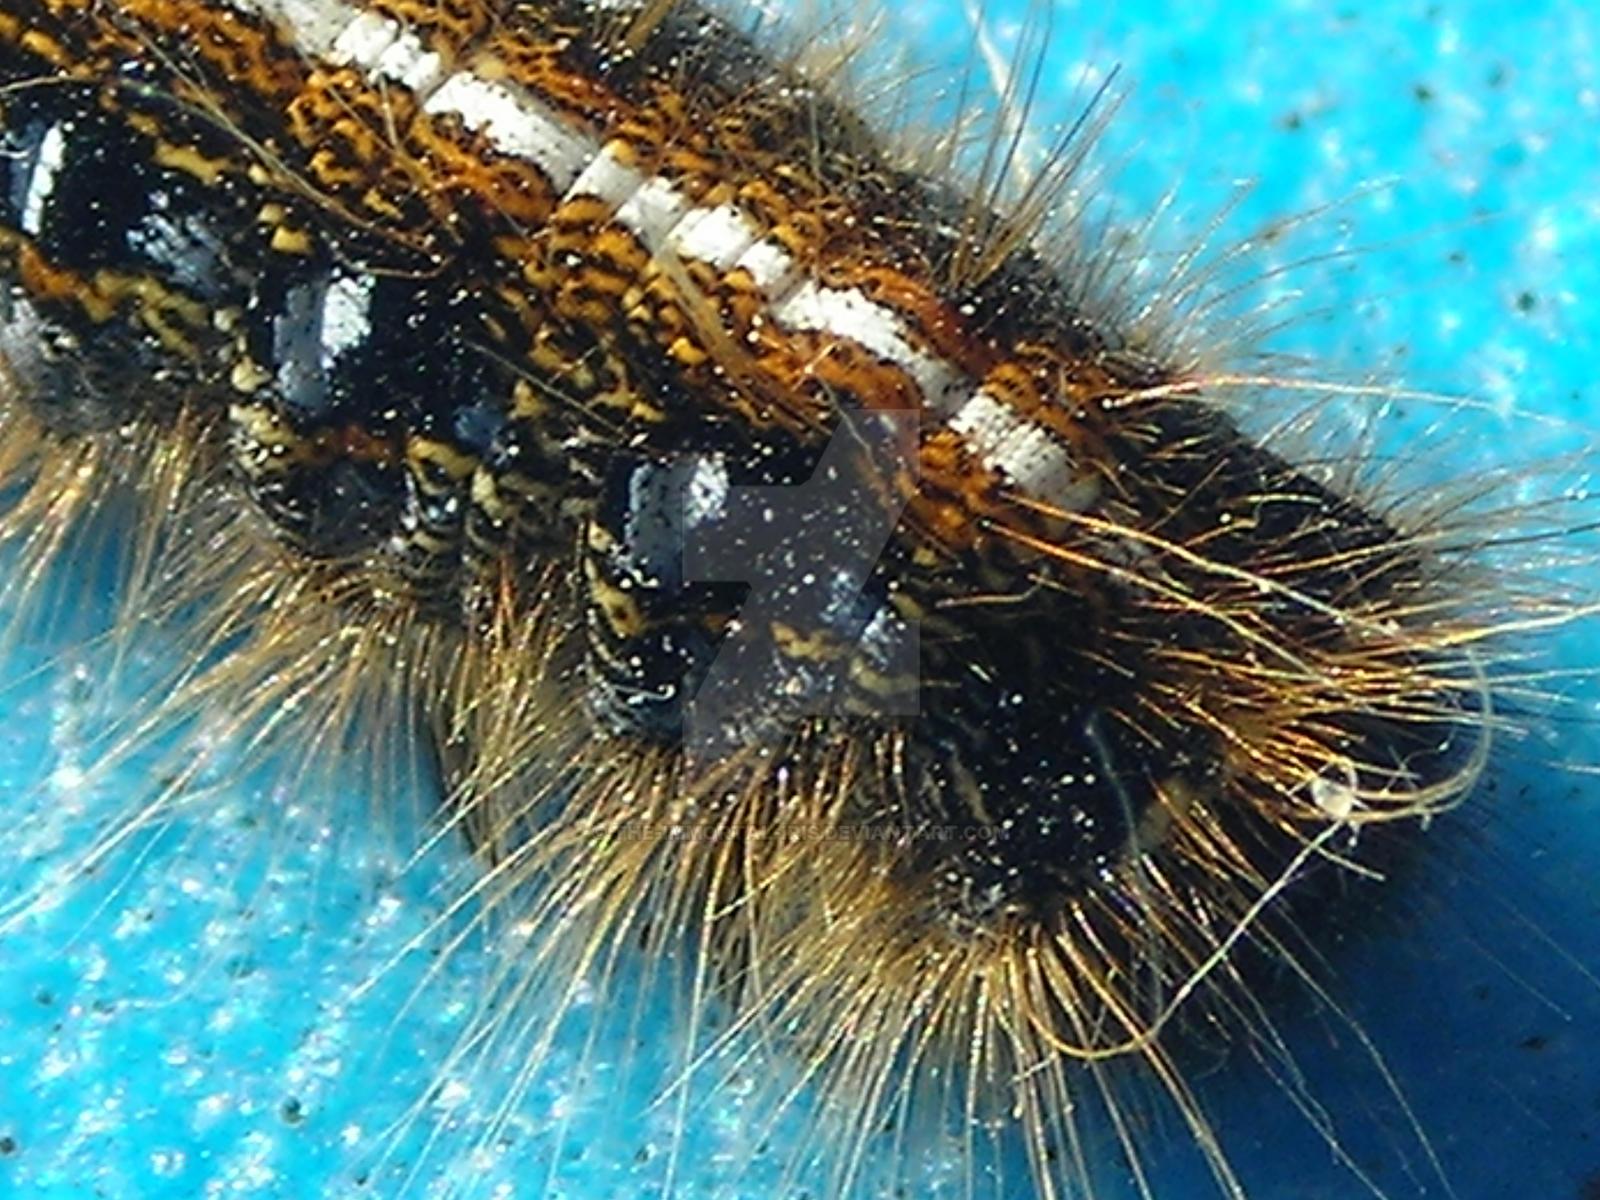 Caterpillar by The-Immortal-Iris